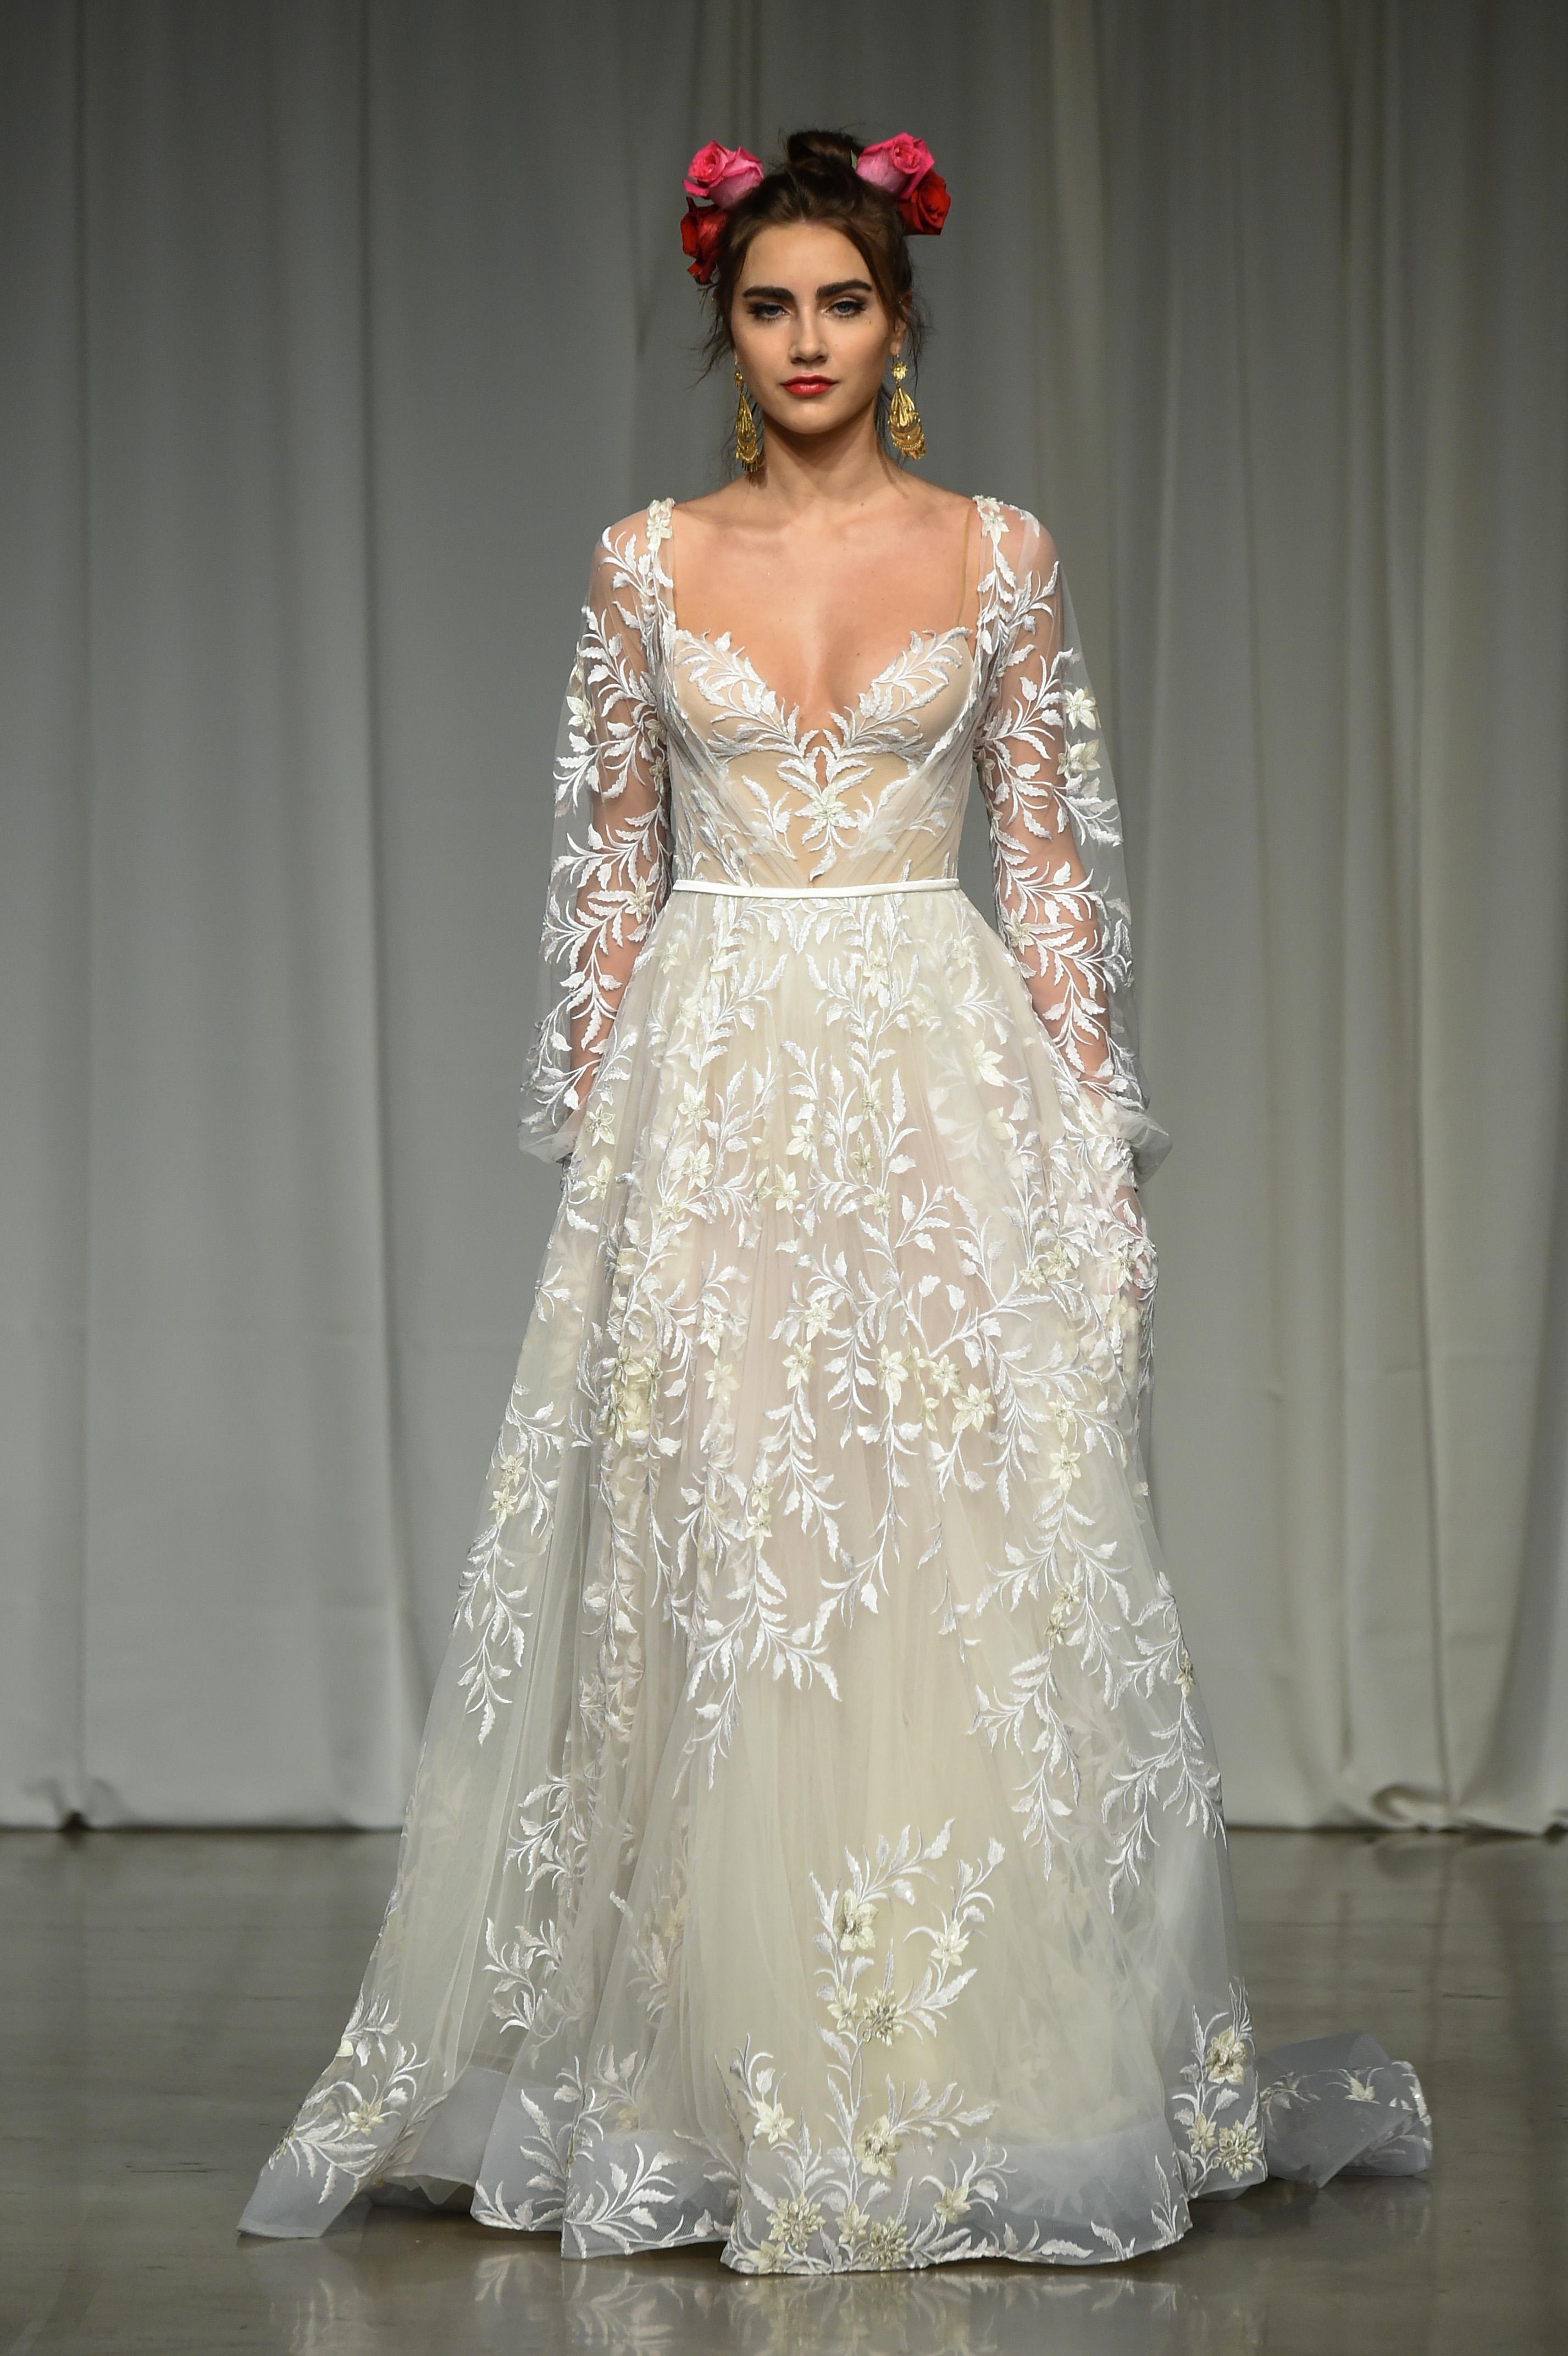 julie vino group fall 2019 sheer long sleeve a-line wedding dress